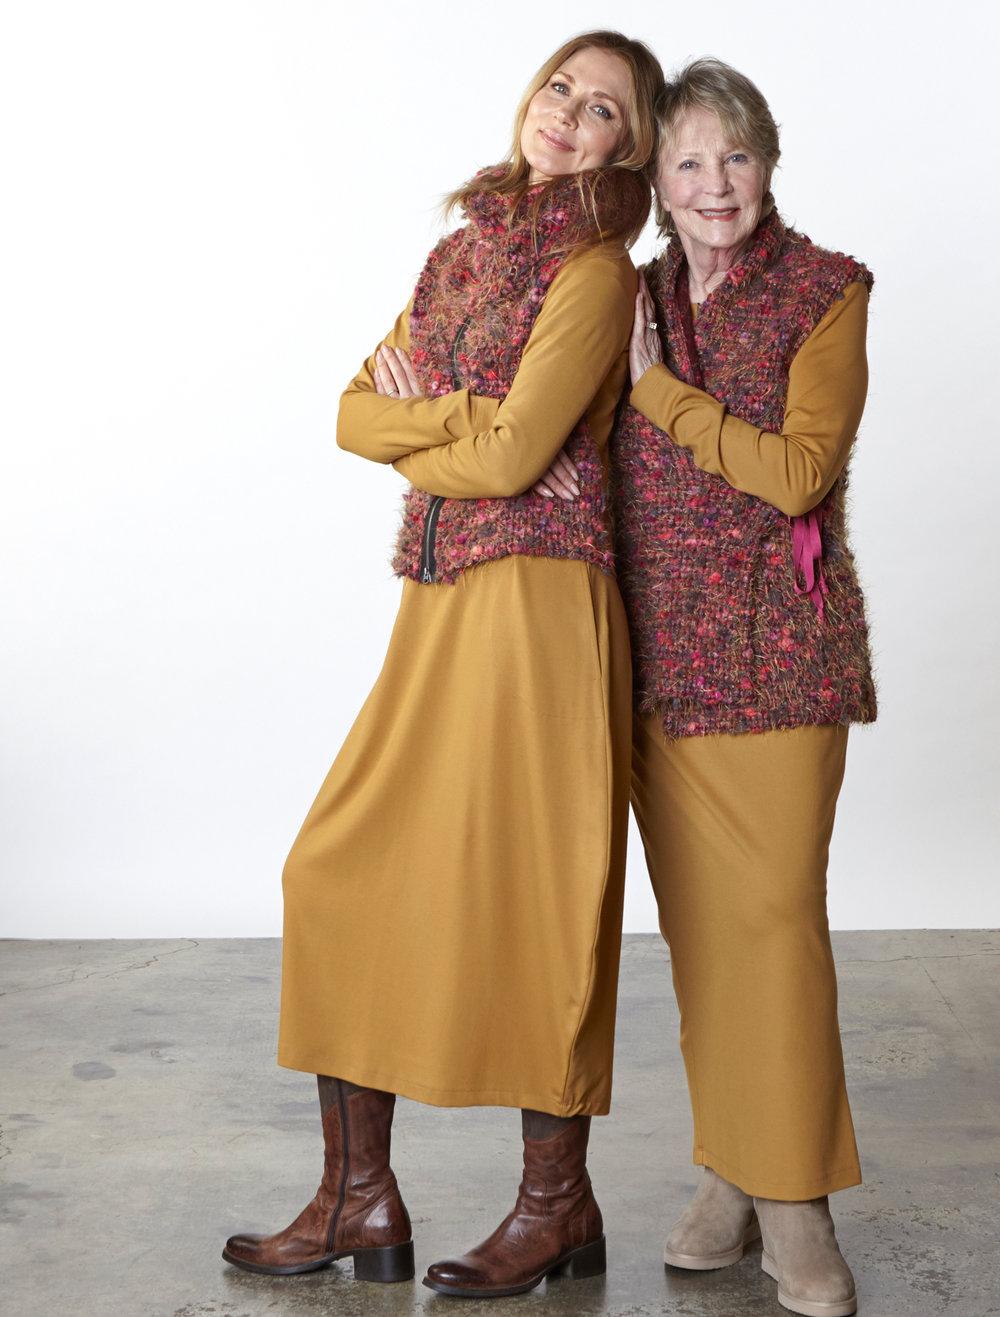 Cowlneck Scarf, Betz Cardigan, Eddie Vest in Fuchsia Italian Boucle, Philippa Dress, Cindi Shirt, Slim Skirt in Camel Modal Ponti